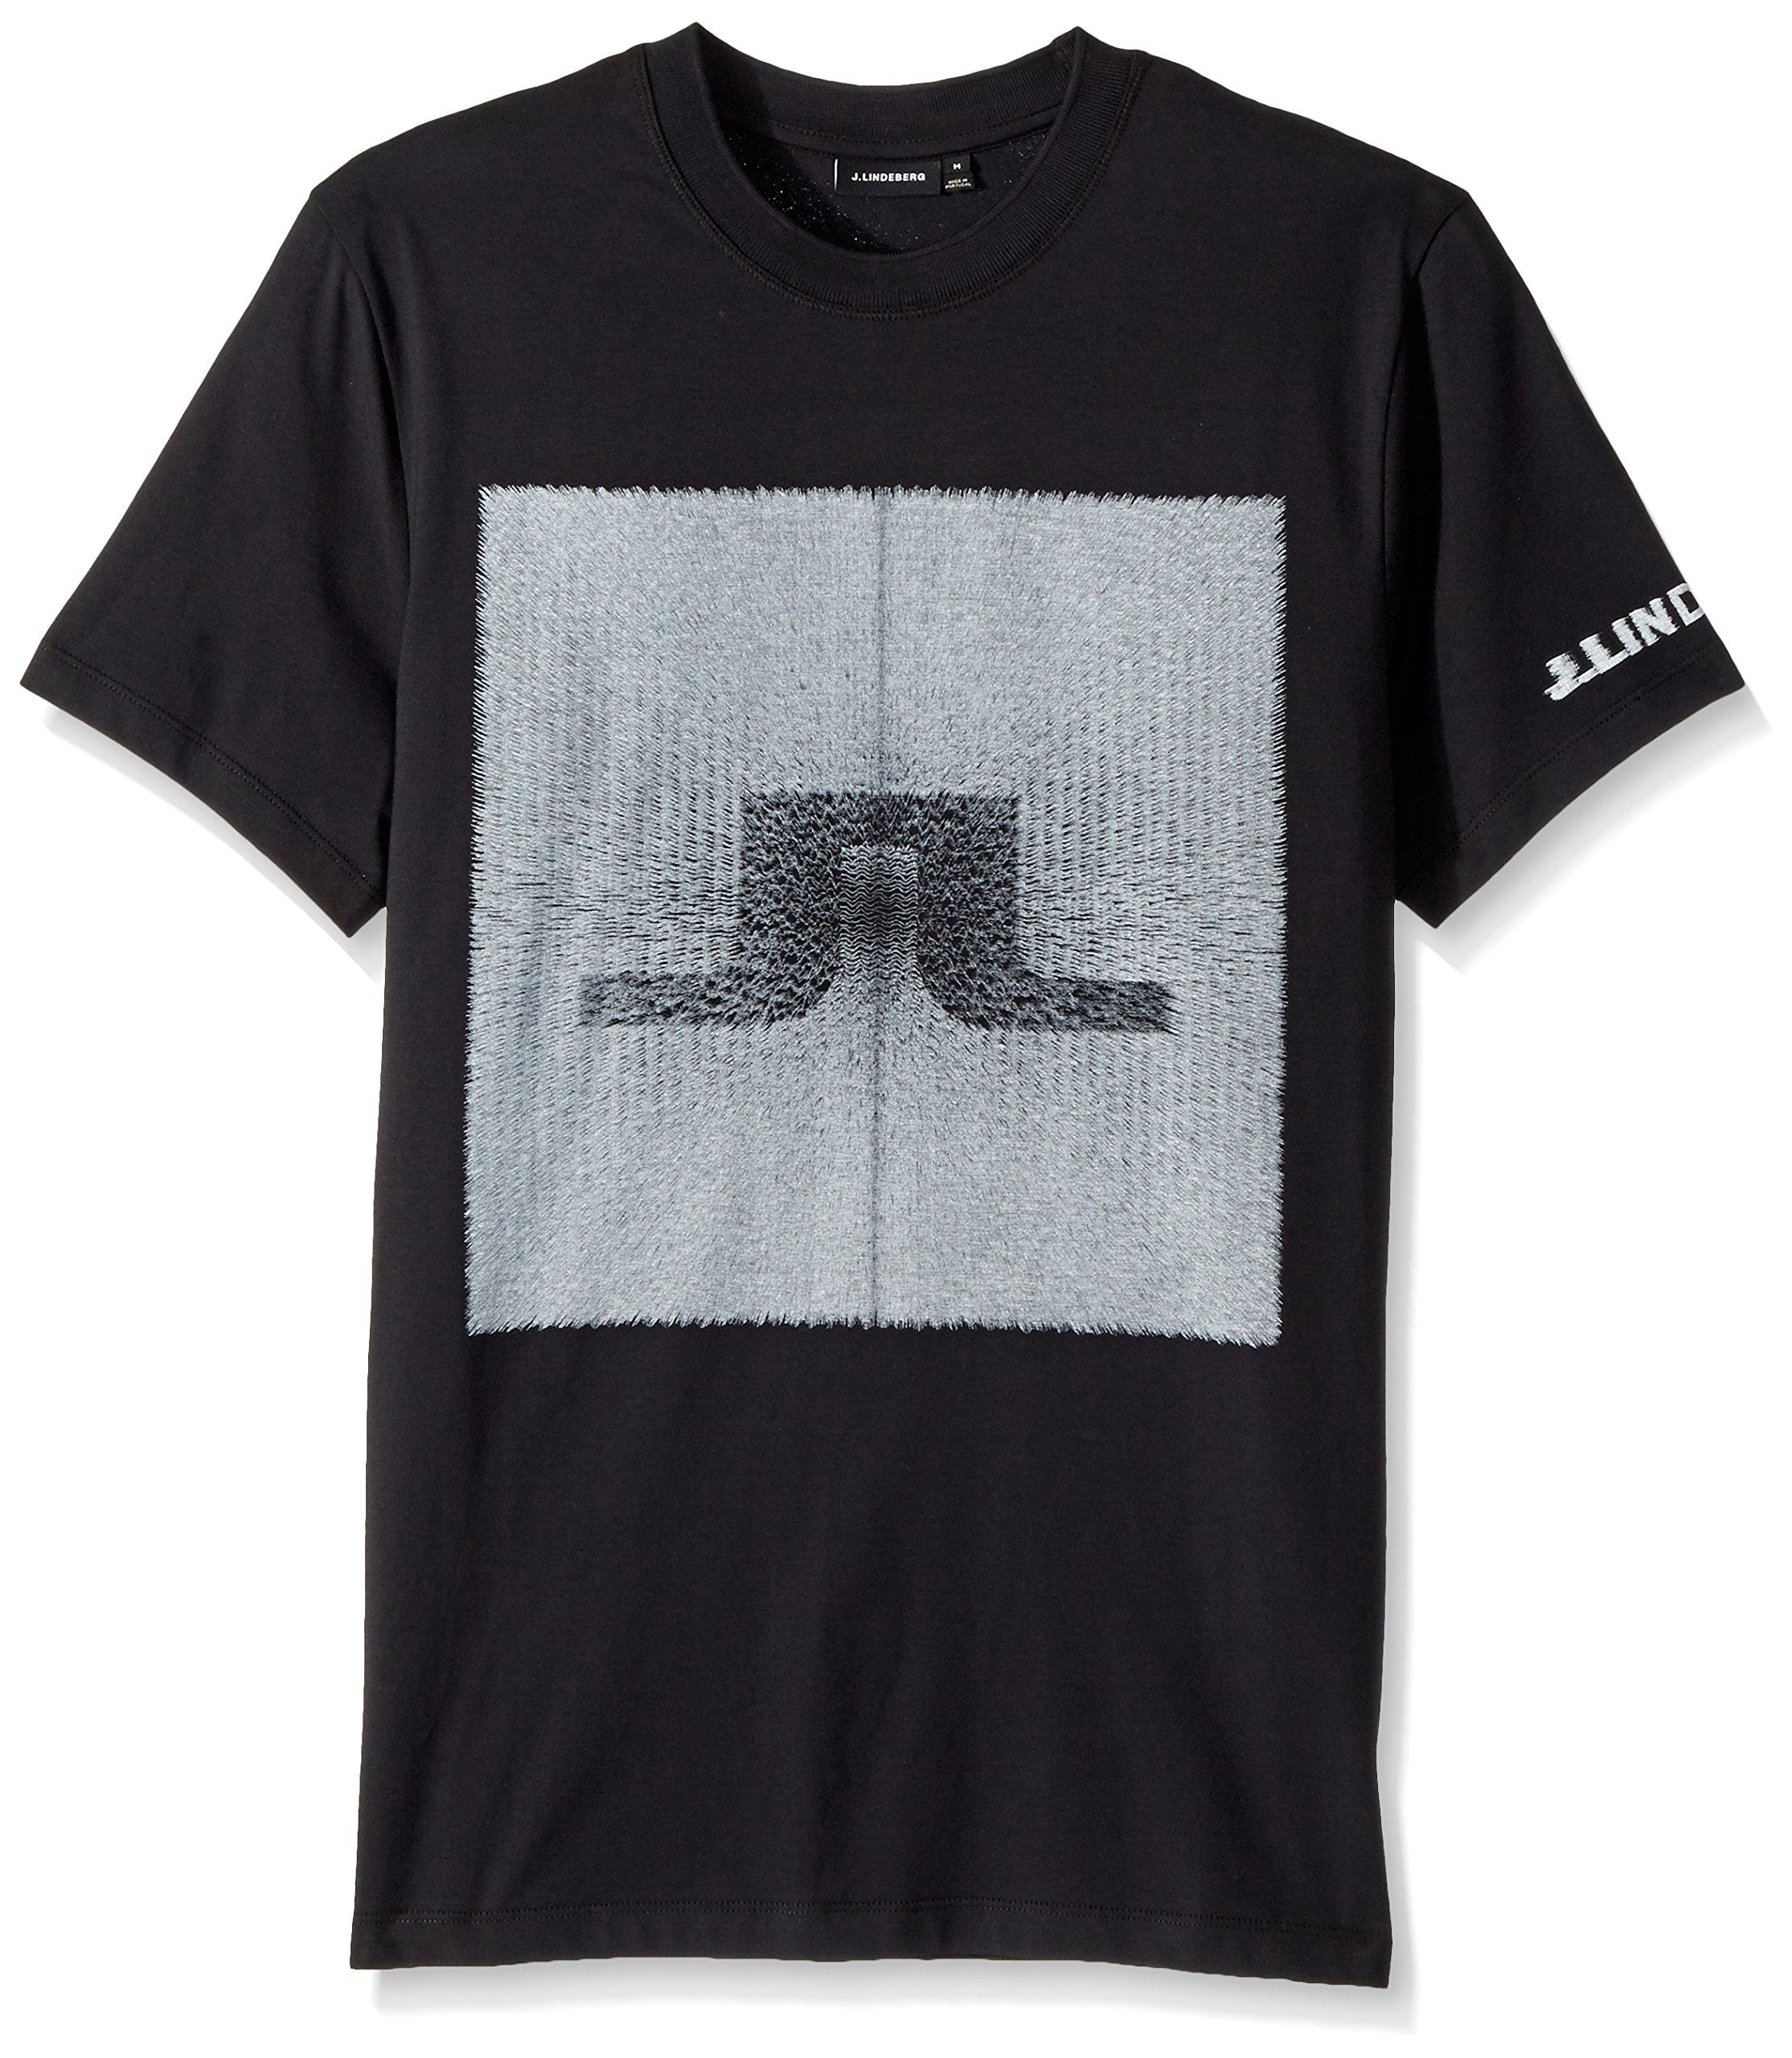 J.Lindeberg Men's Logo Cotton Tee, Black, XXL